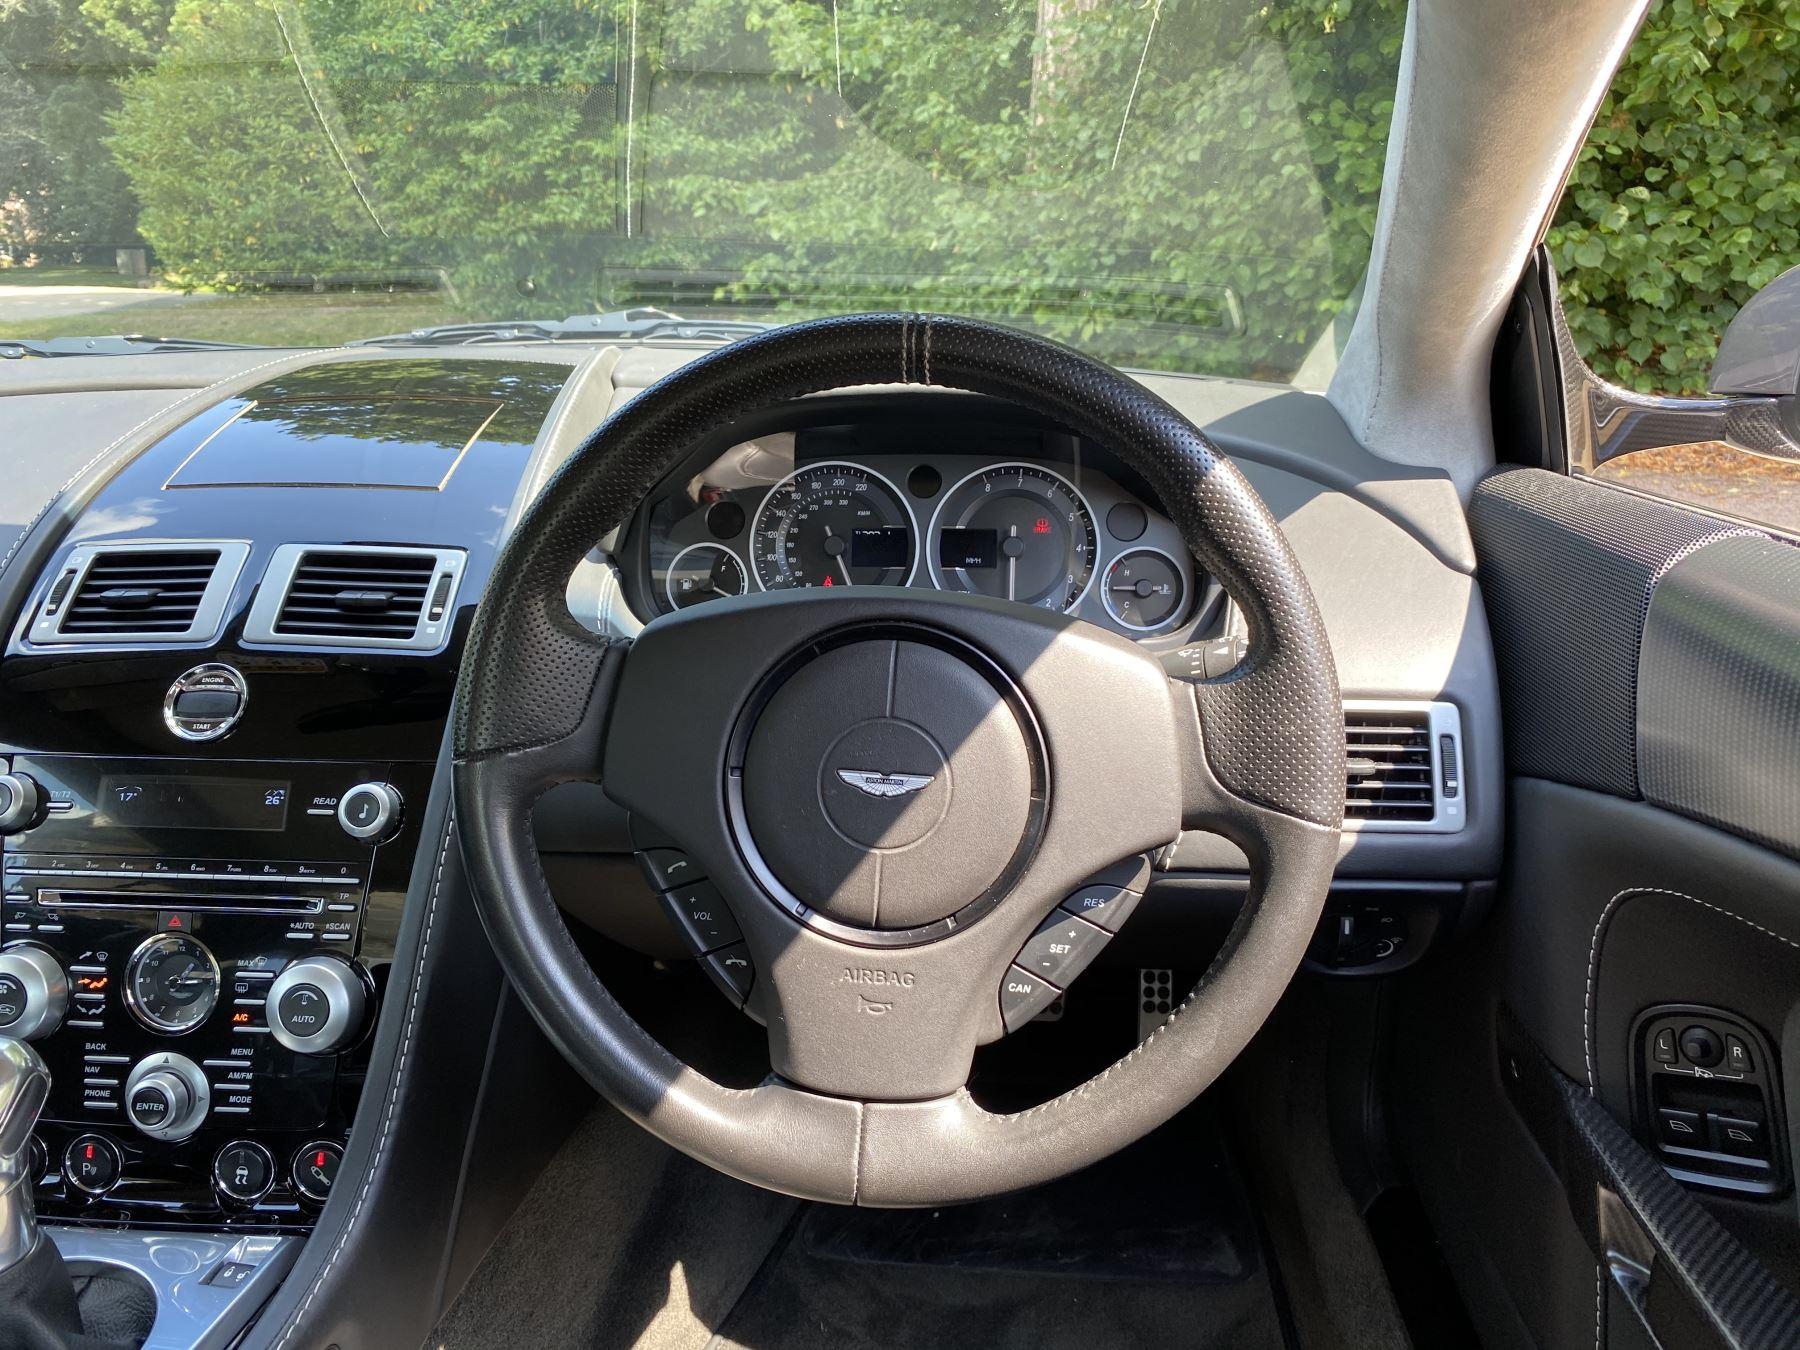 Aston Martin DBS V12 2dr image 17